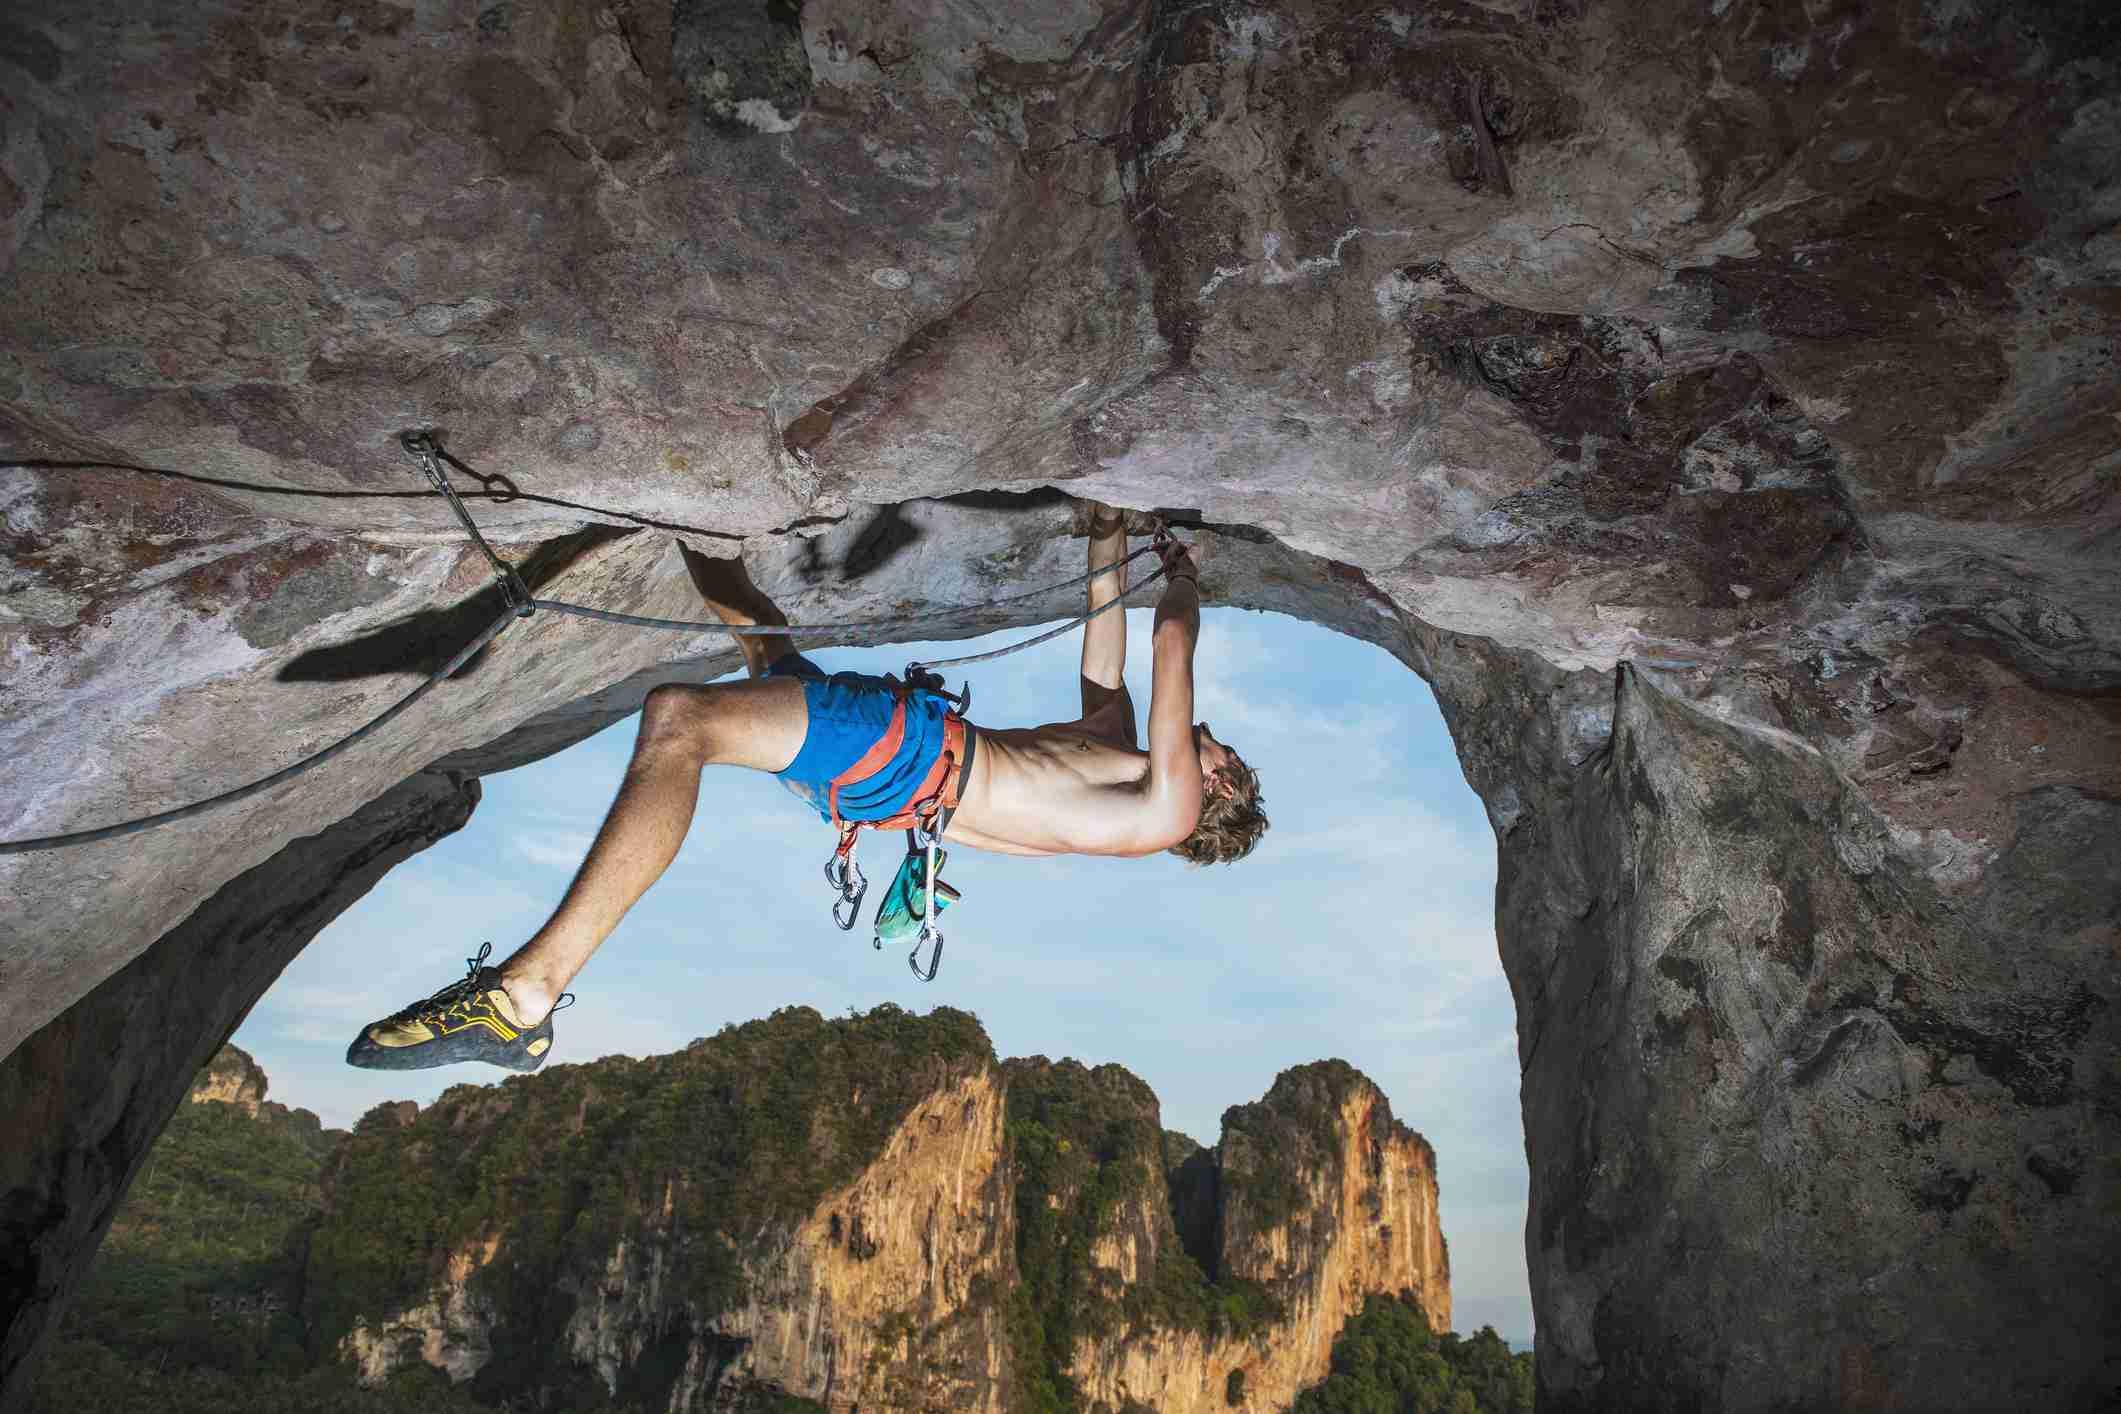 Rock climber climbing on Burnt Offerings, Tonsai, Railay Beach, Krabi, Thailand